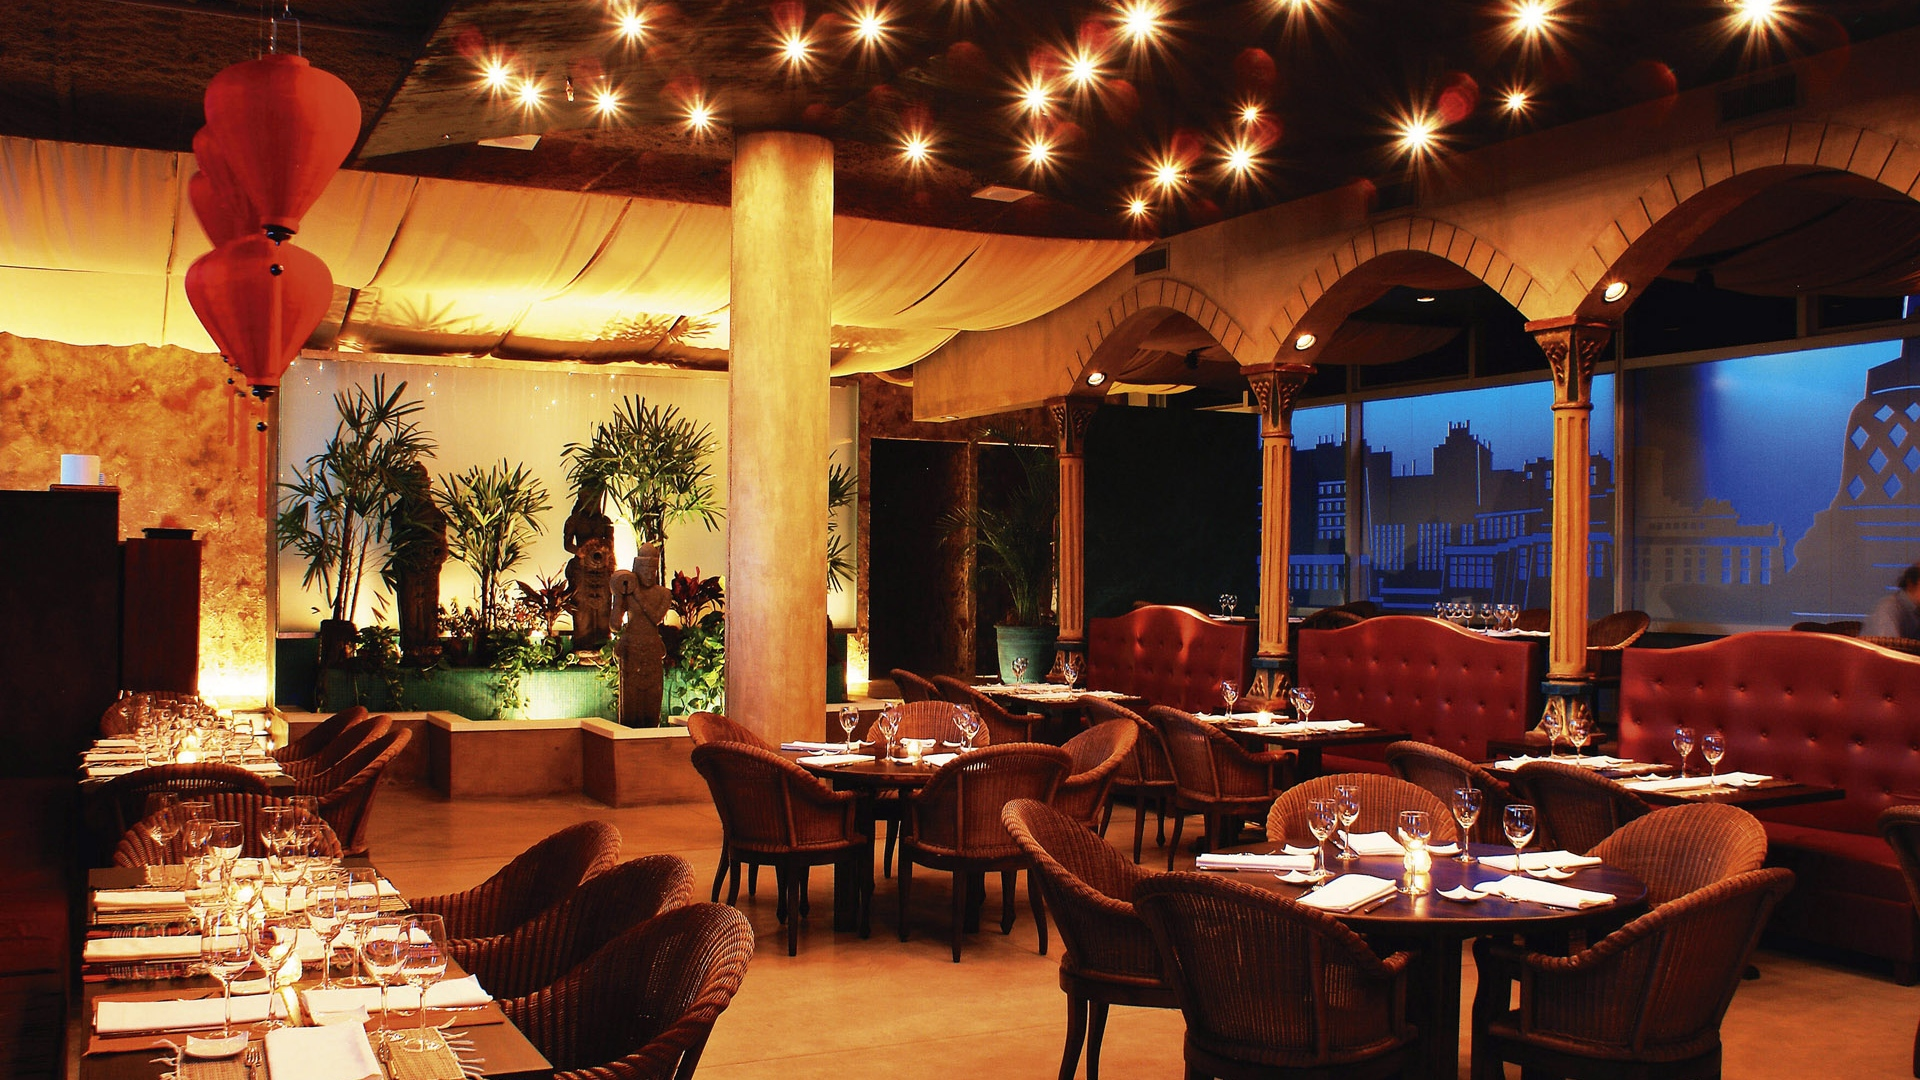 Download wallpaper restaurant table interior